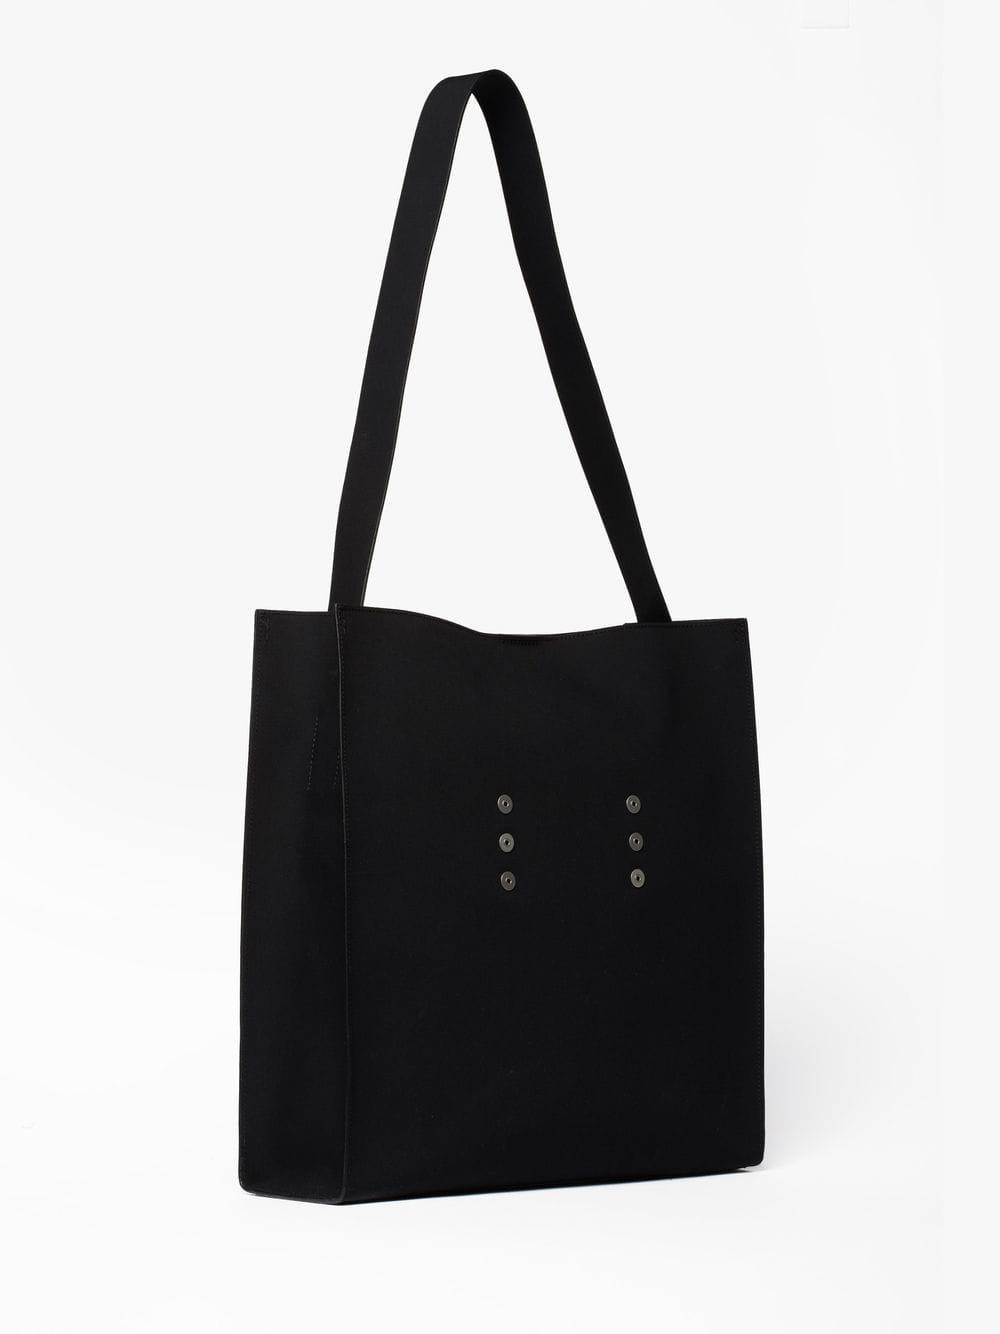 0764157a92 Mackintosh Black Bonded Cotton 0002 Tote Bag in Black for Men - Lyst